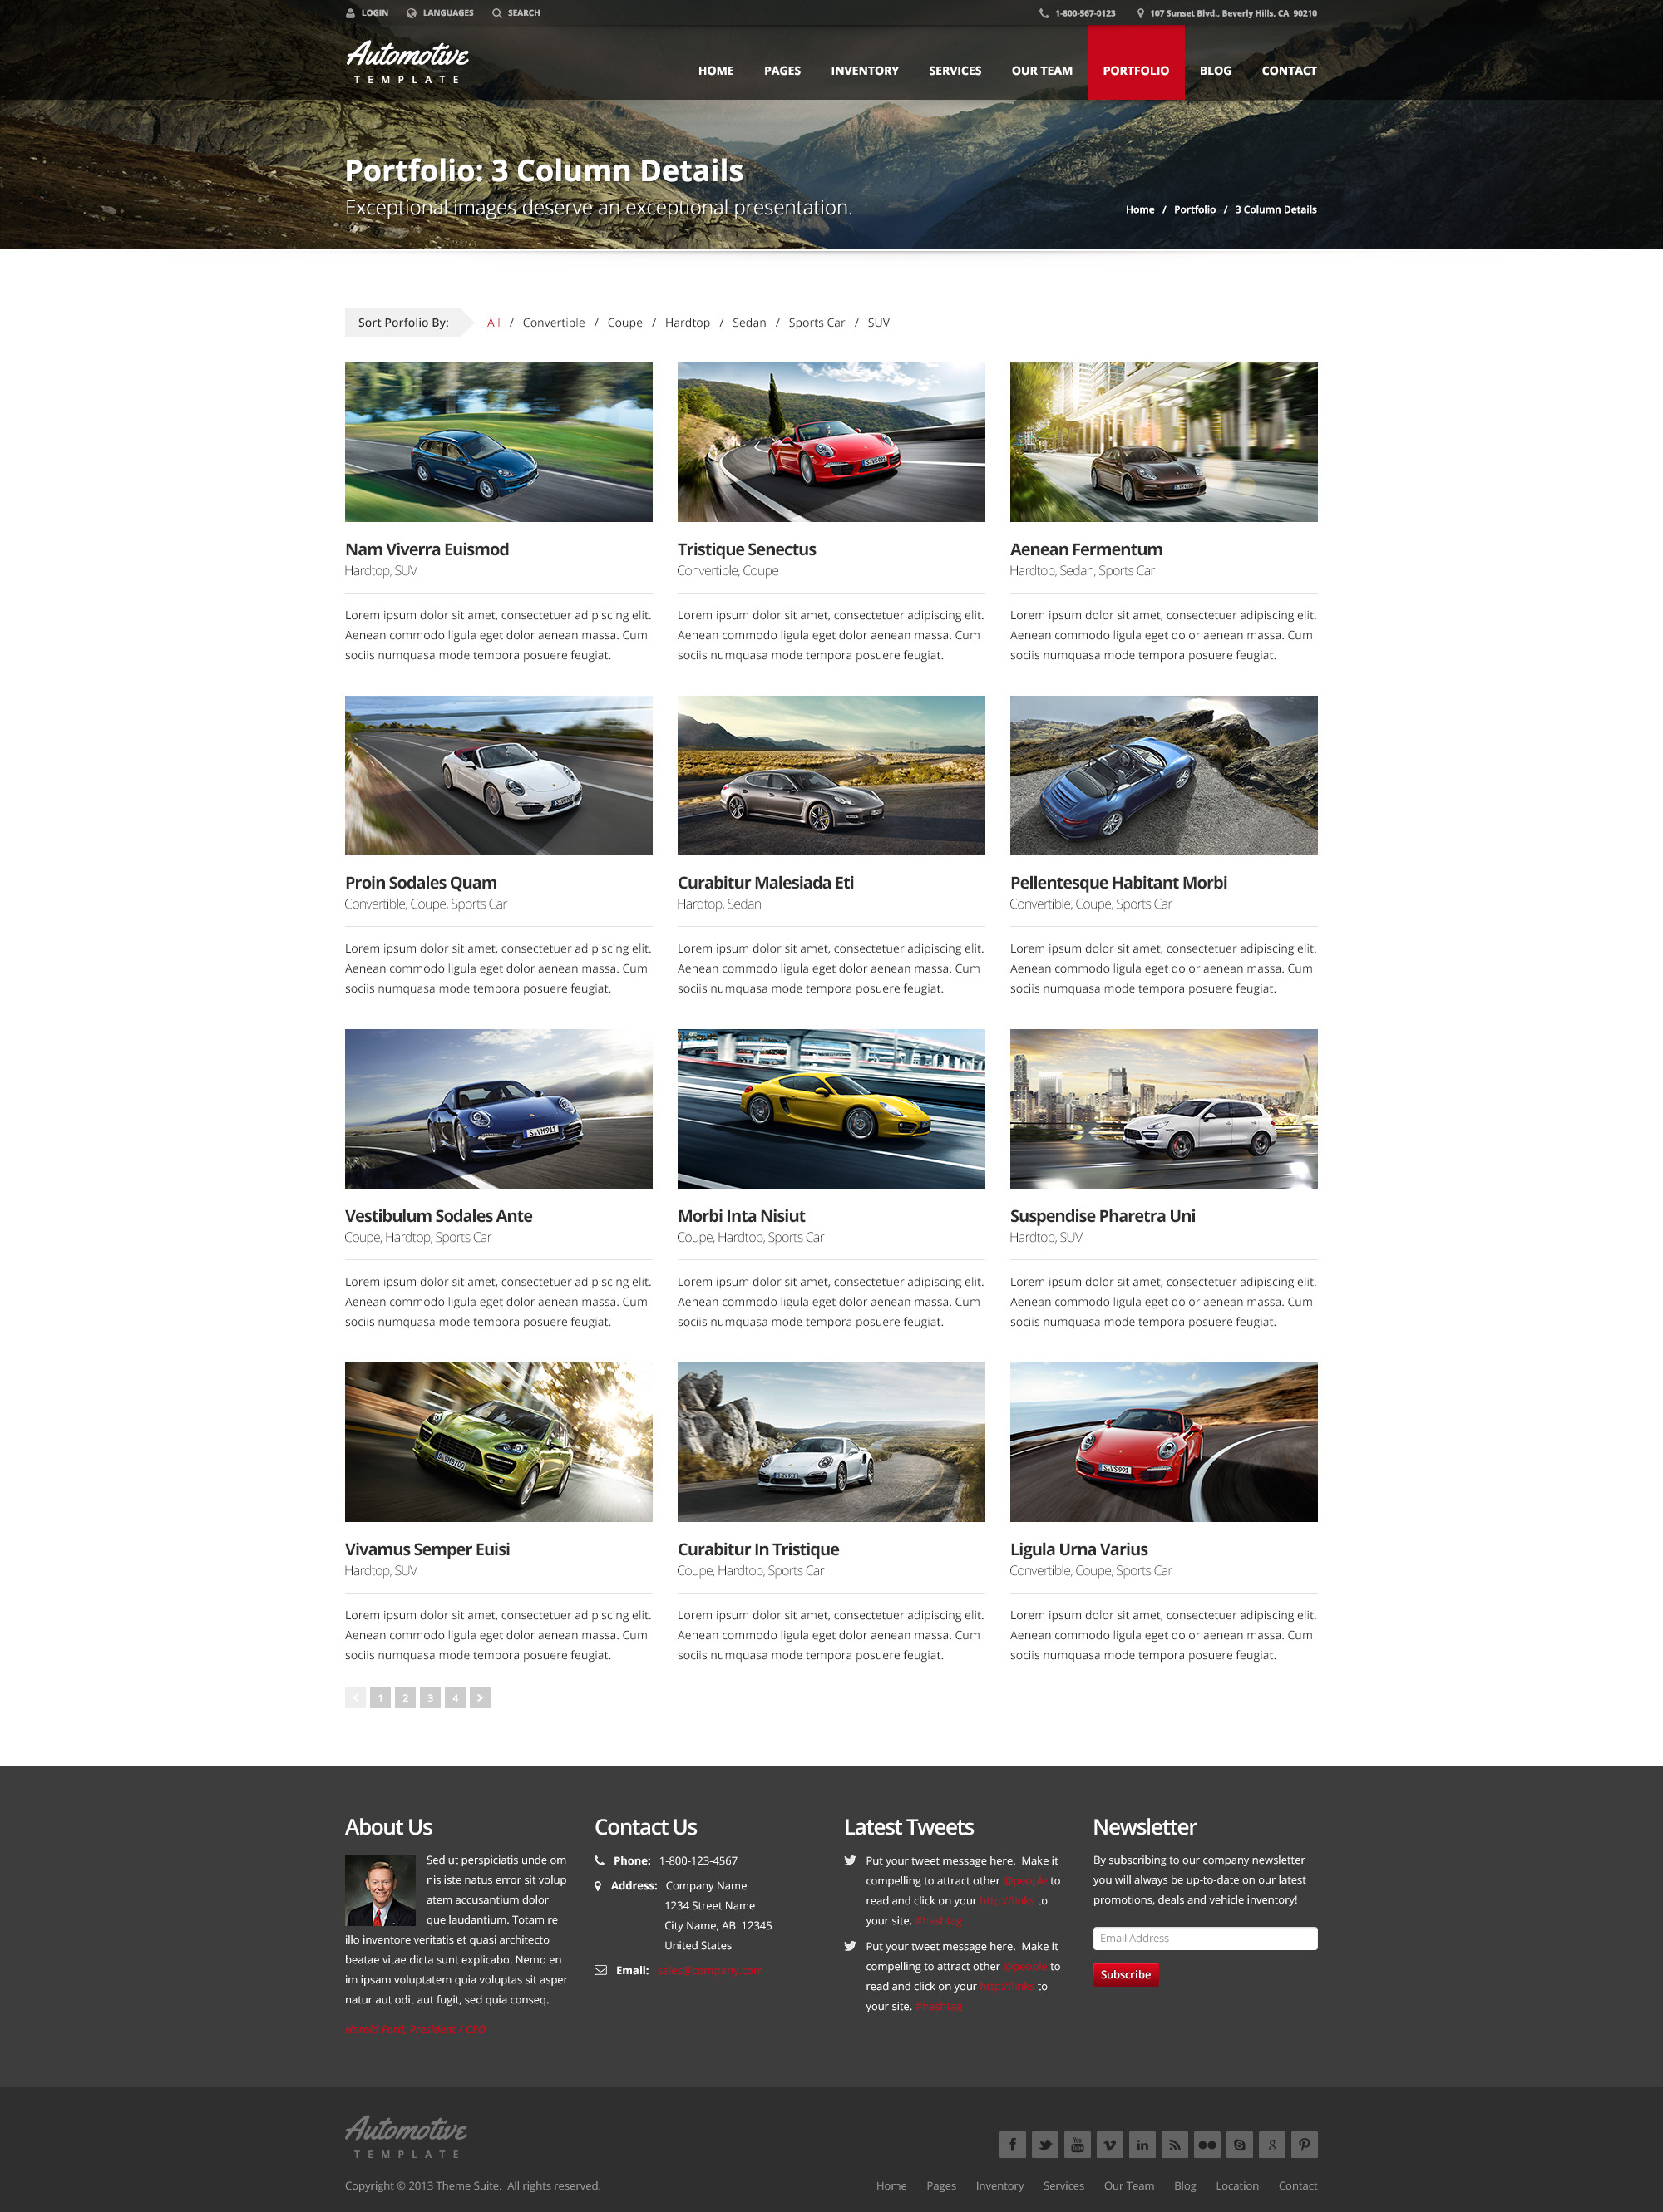 screenshots 23_portfolio 3 column details jpg